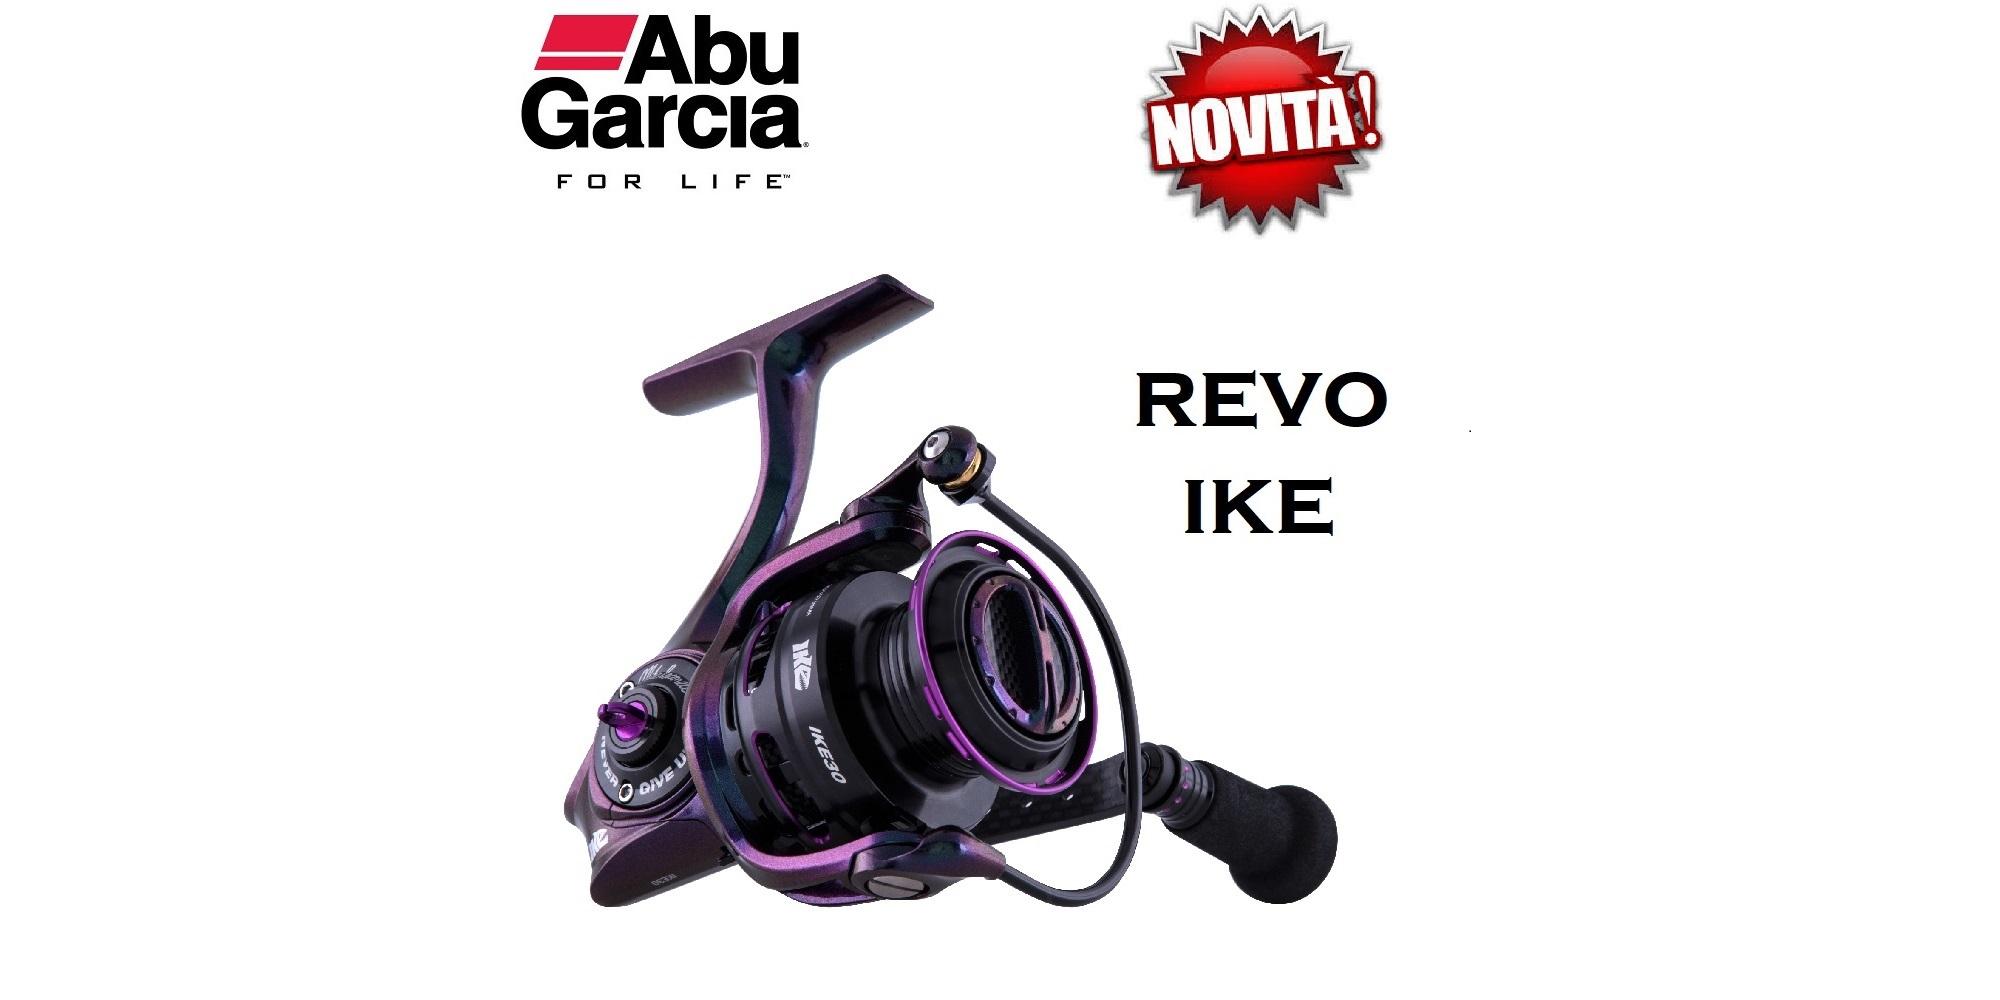 Mulinello Abu Garcia Revo Ike REVO2IKESP20  cod 1475708